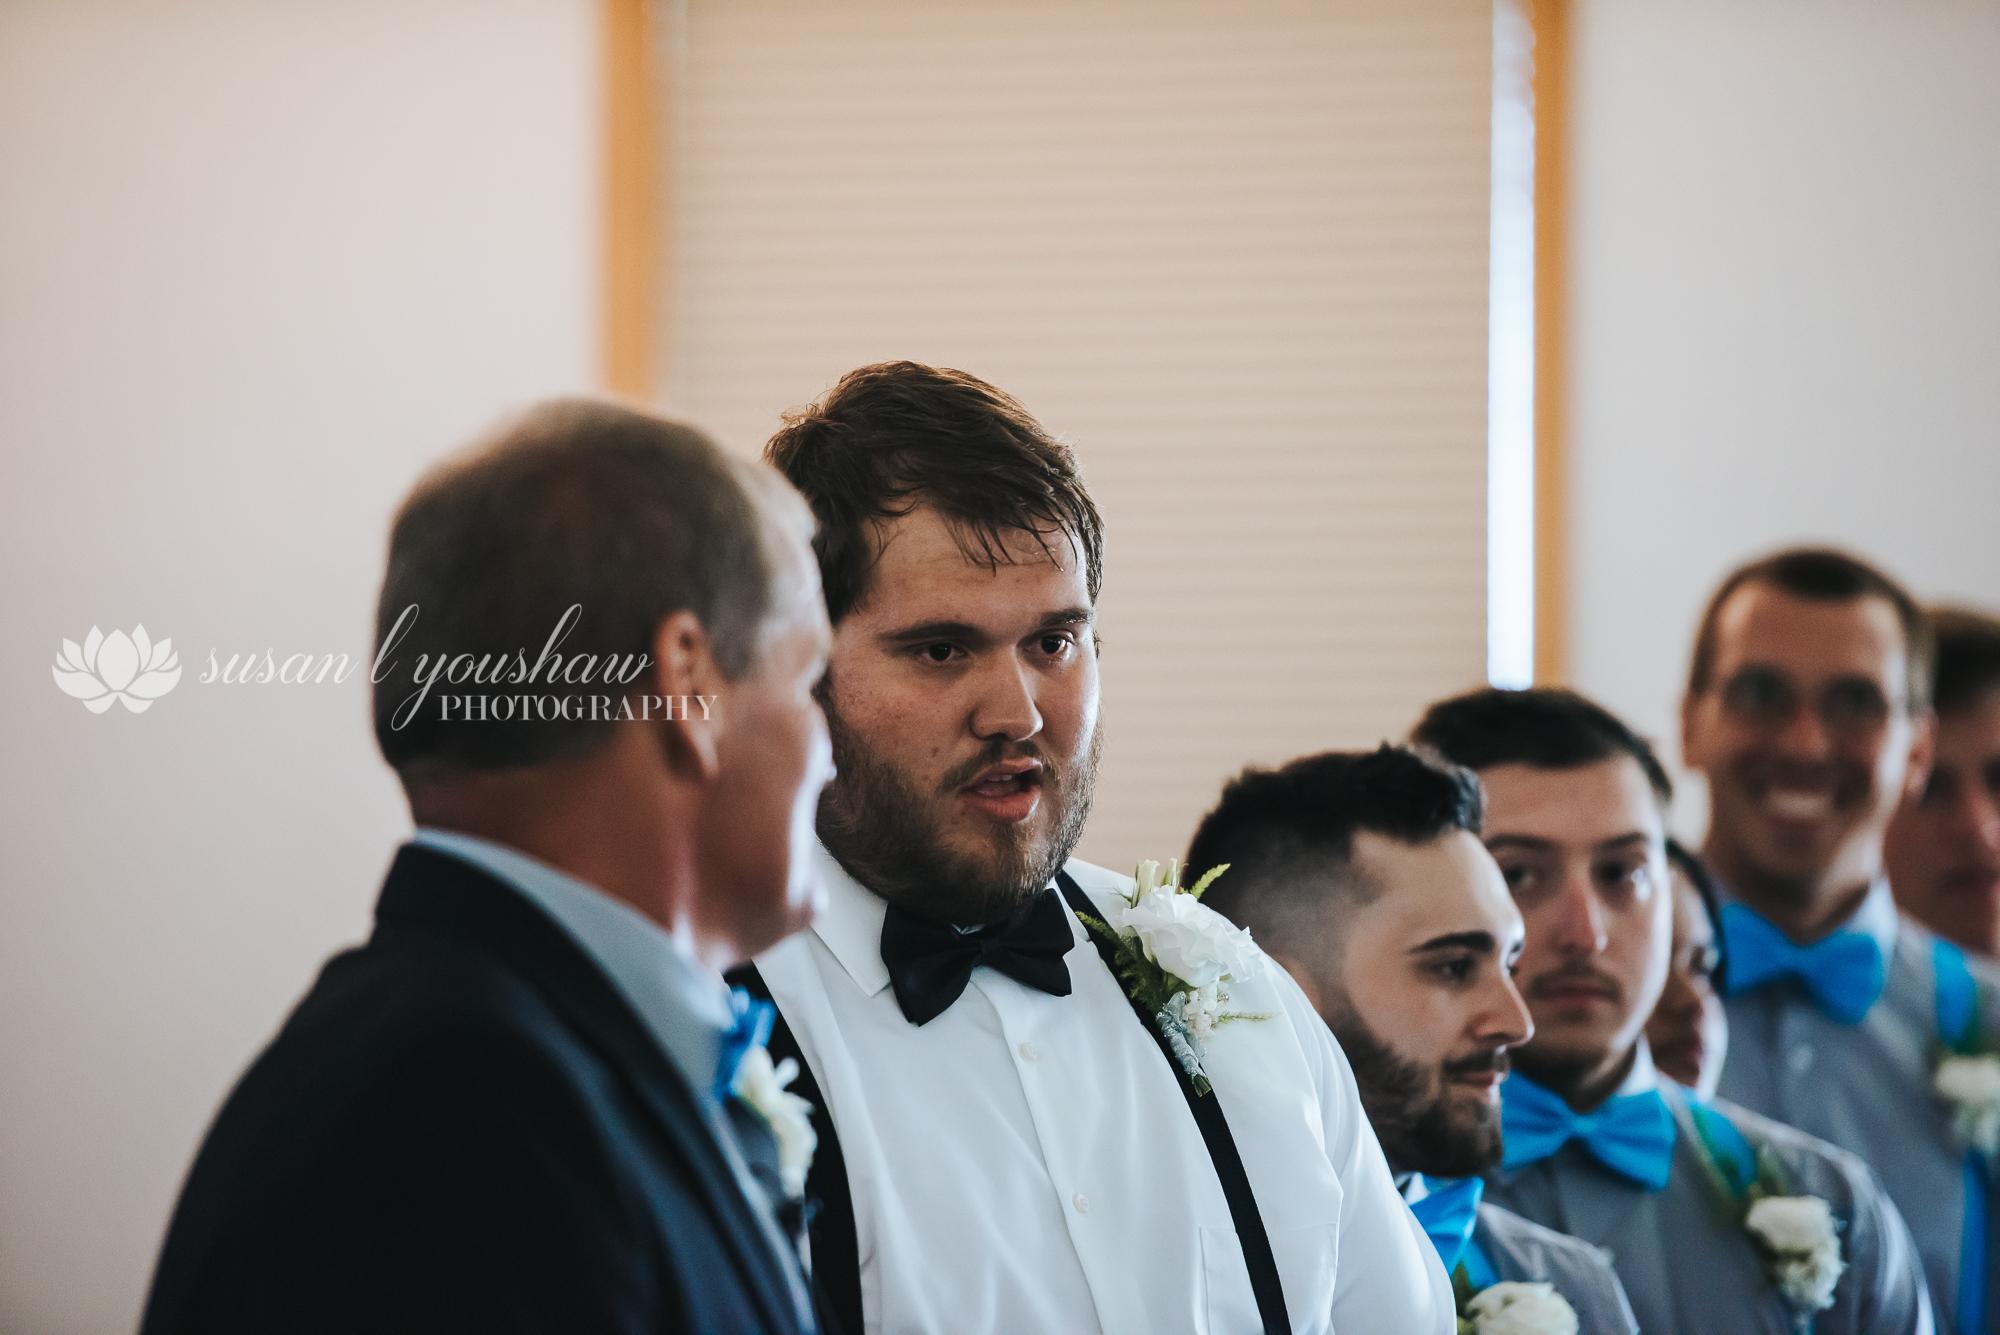 Katelyn and Wes Wedding Photos 07-13-2019 SLY Photography-45.jpg